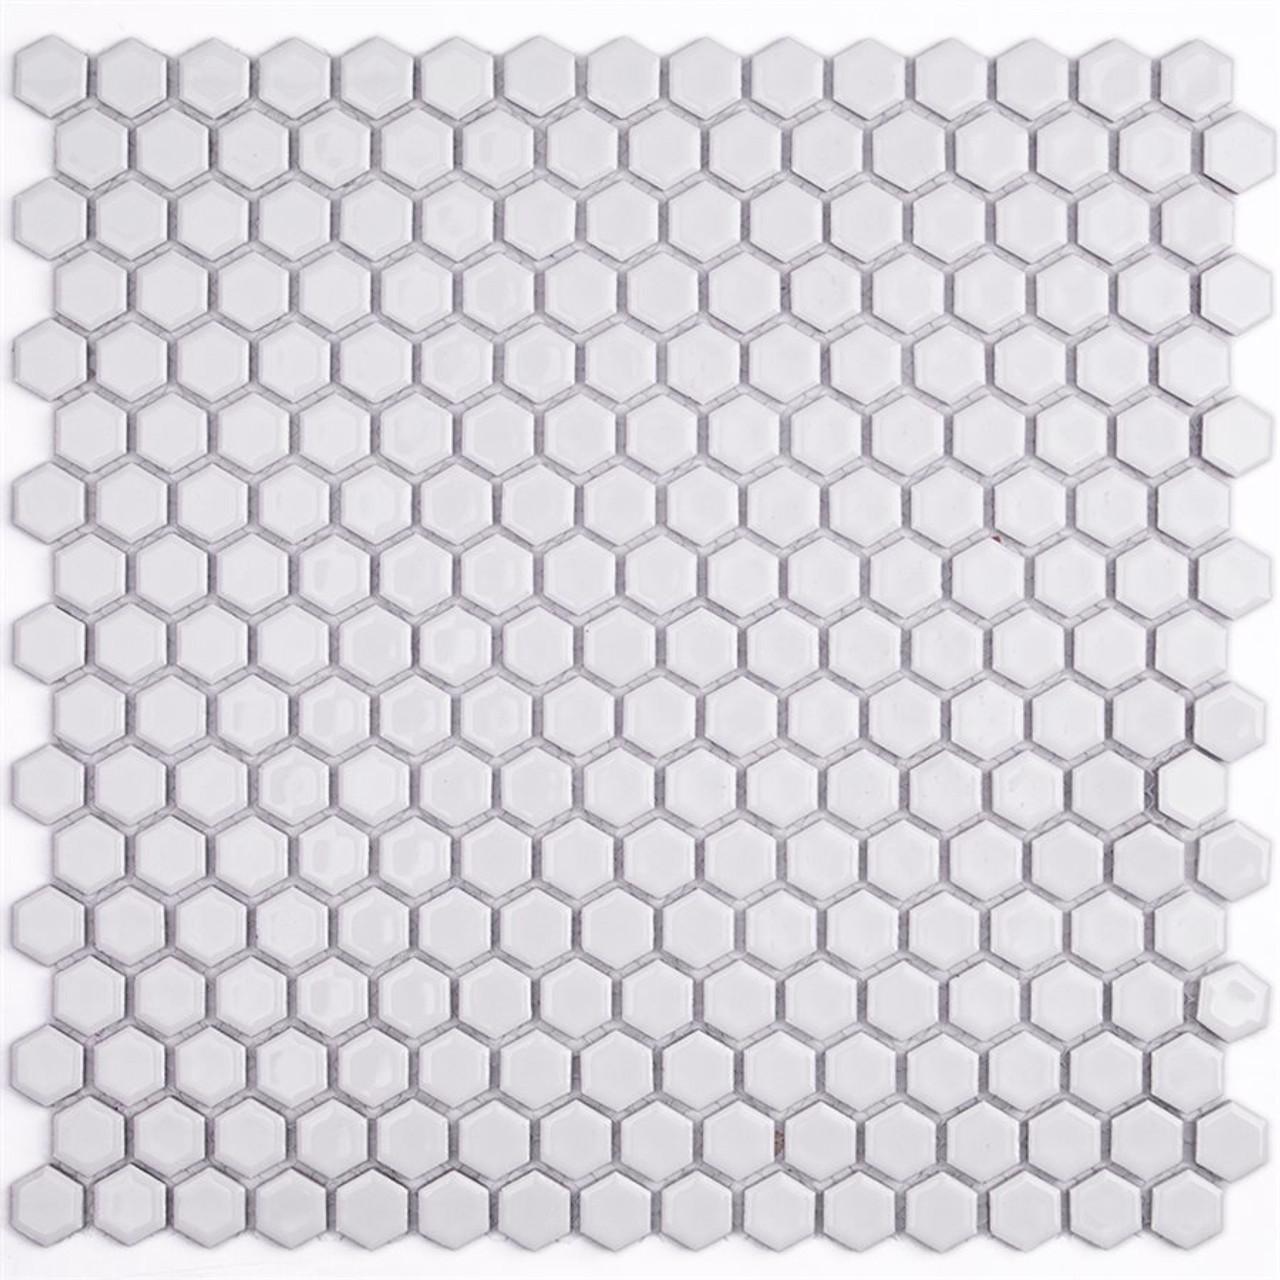 Soho Studio Simple Hexagon Solid White Polished